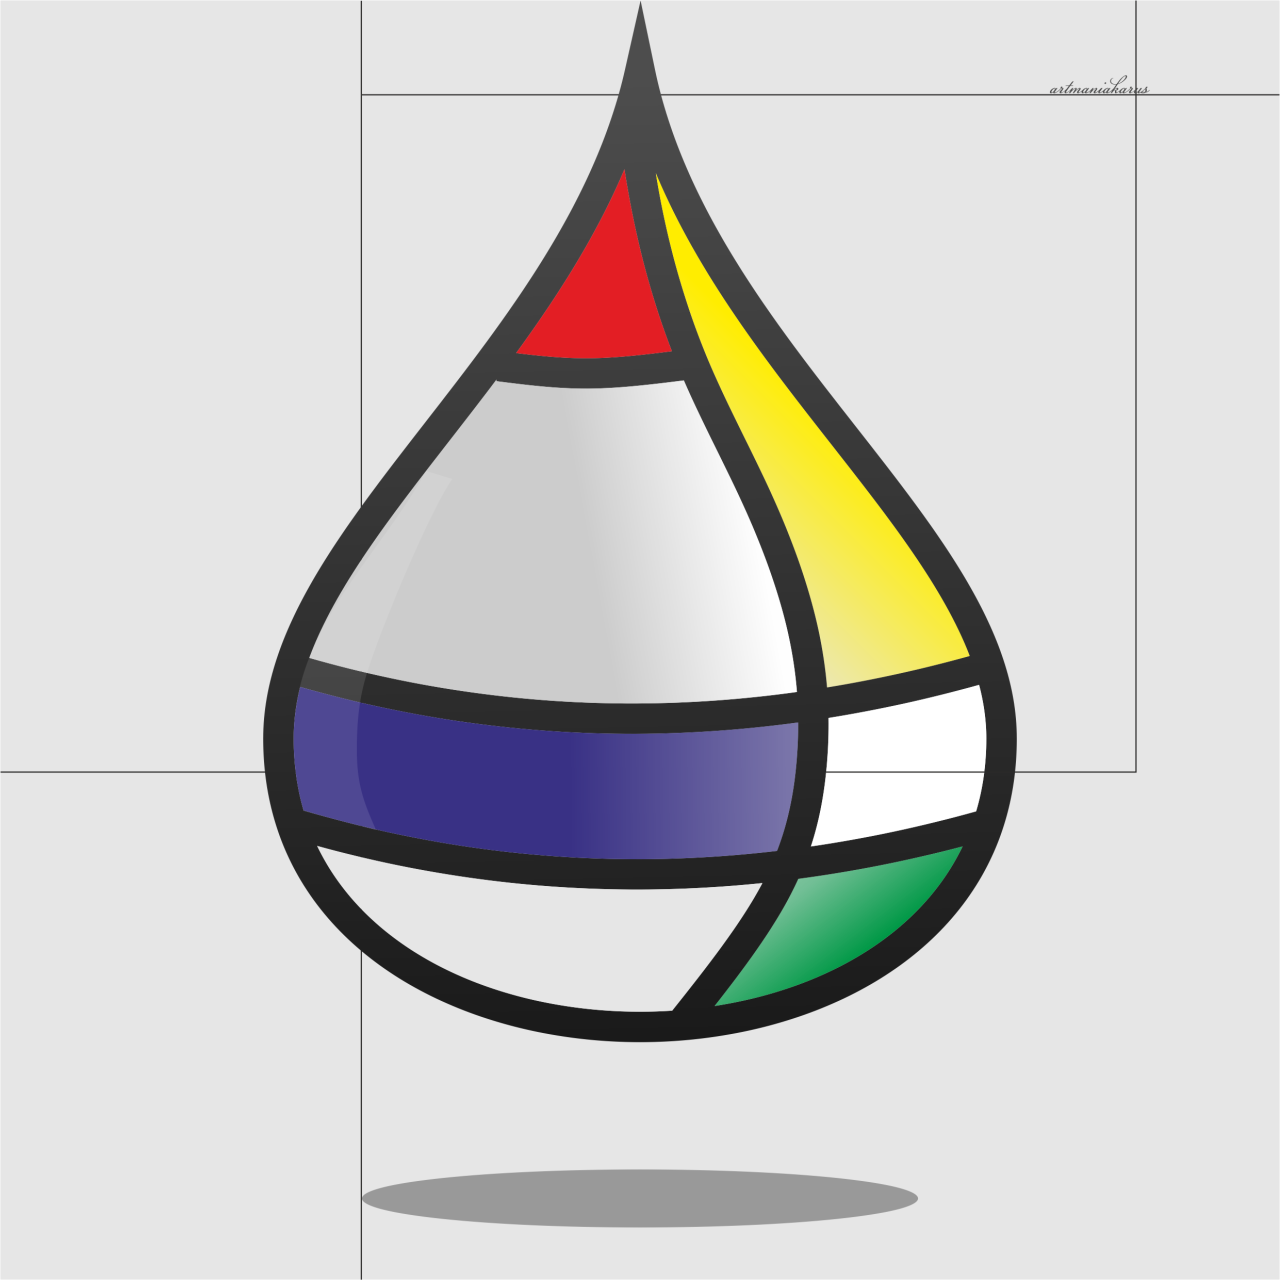 Mondrian By Http Iairs Tumblr Com Math Art Geometric Shapes Art